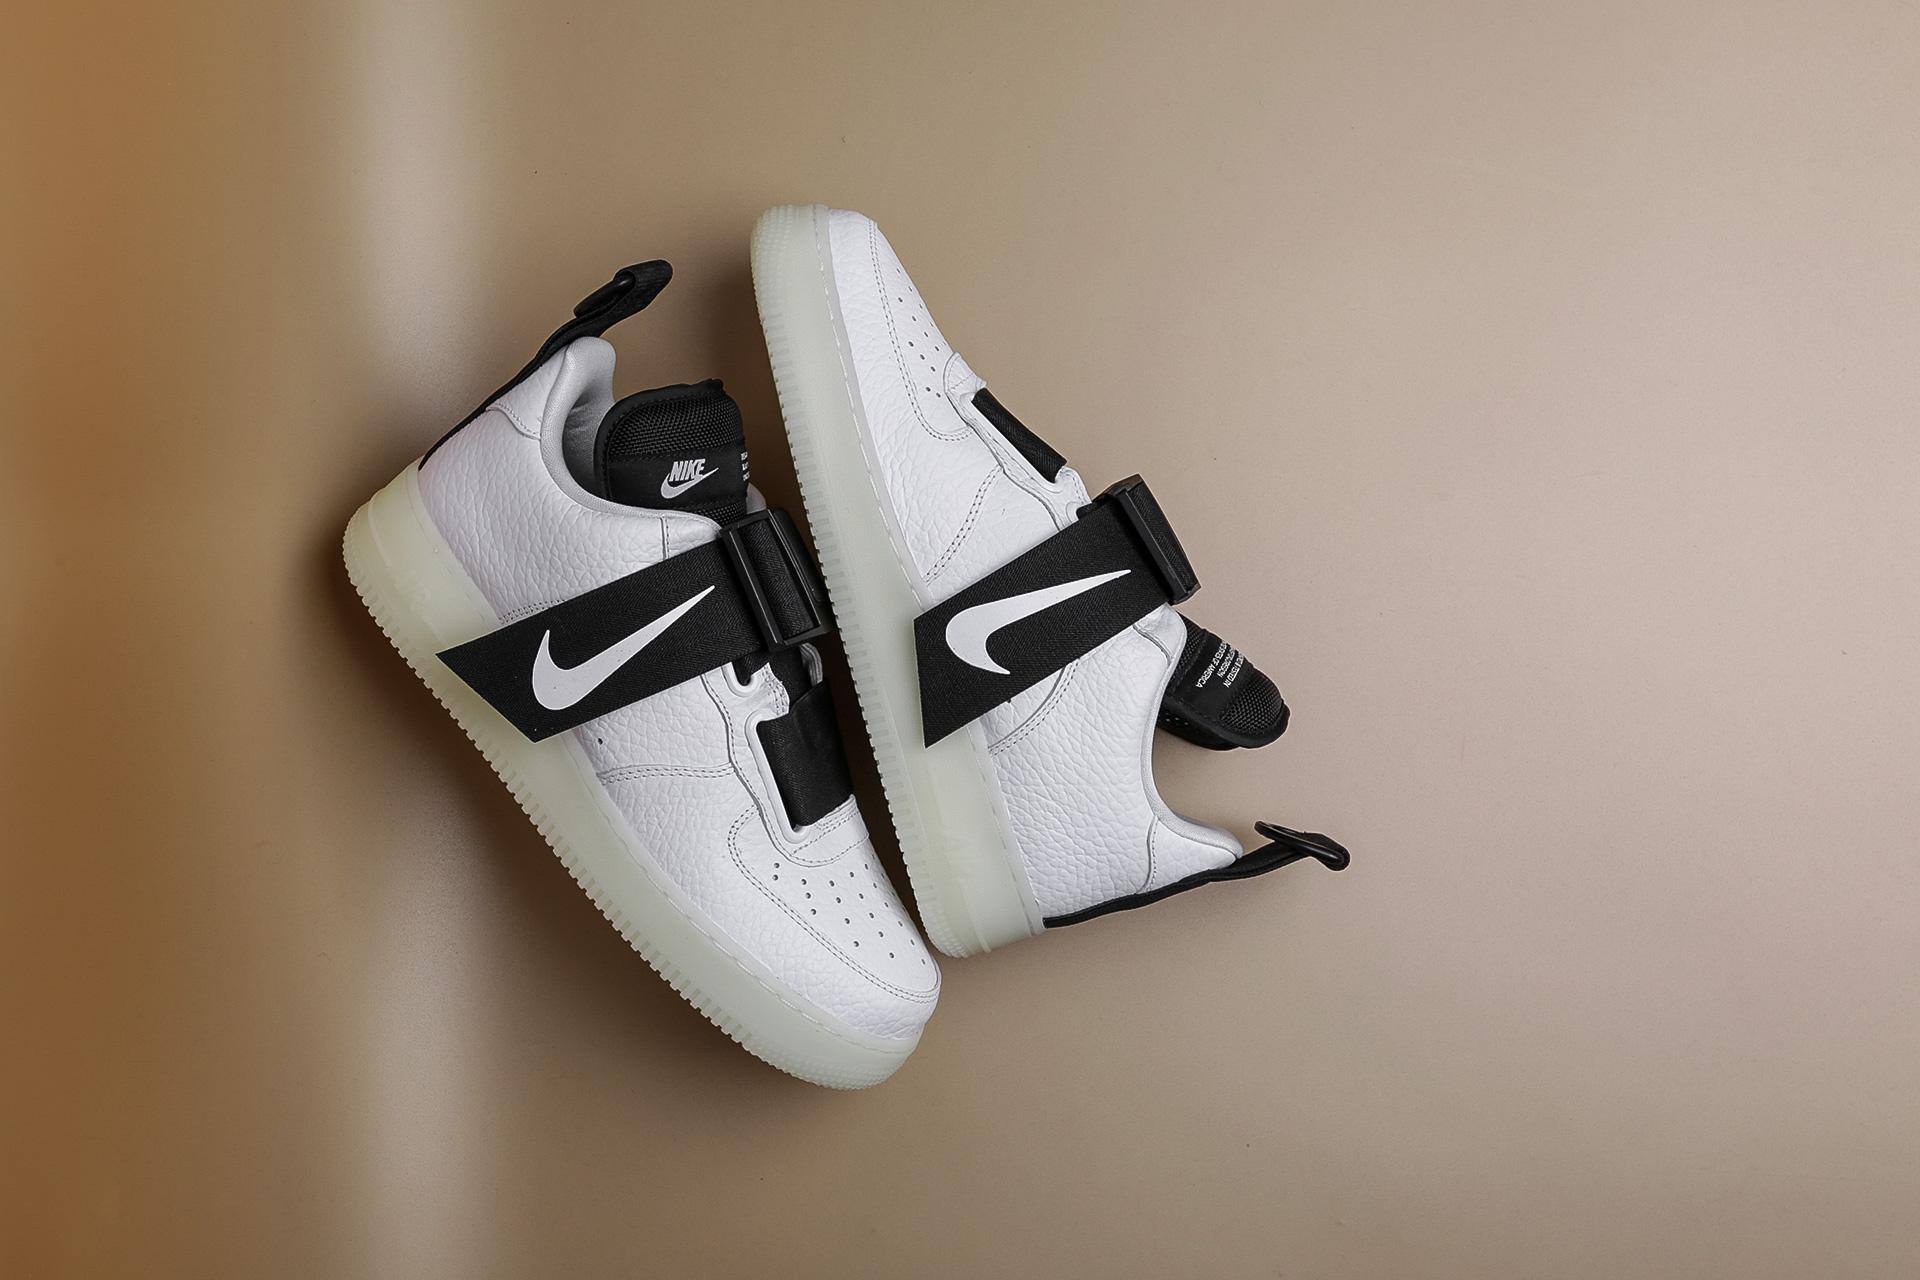 cdbb7cbc Купить белые мужские кроссовки Air Force 1 Utility QS от Nike ...